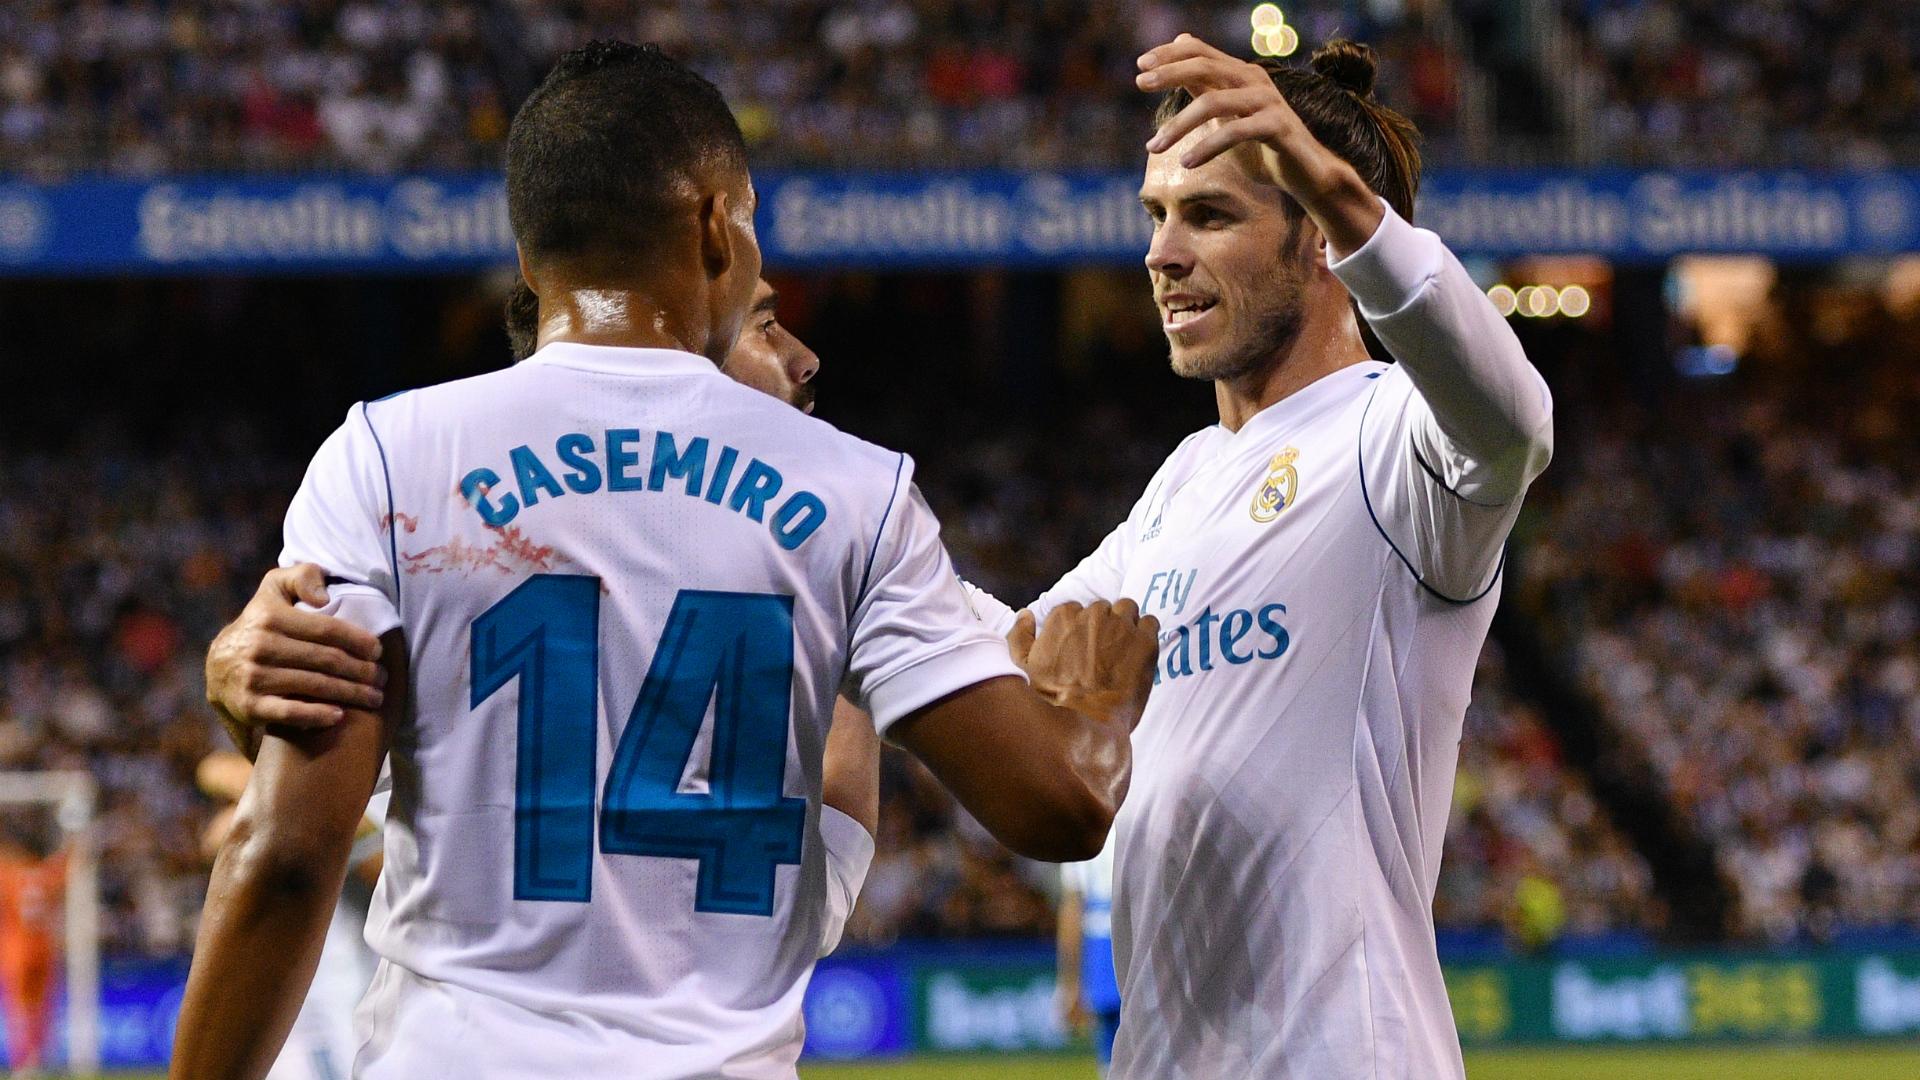 Gareth Bale shines in opening day Deportivo La Coruna win